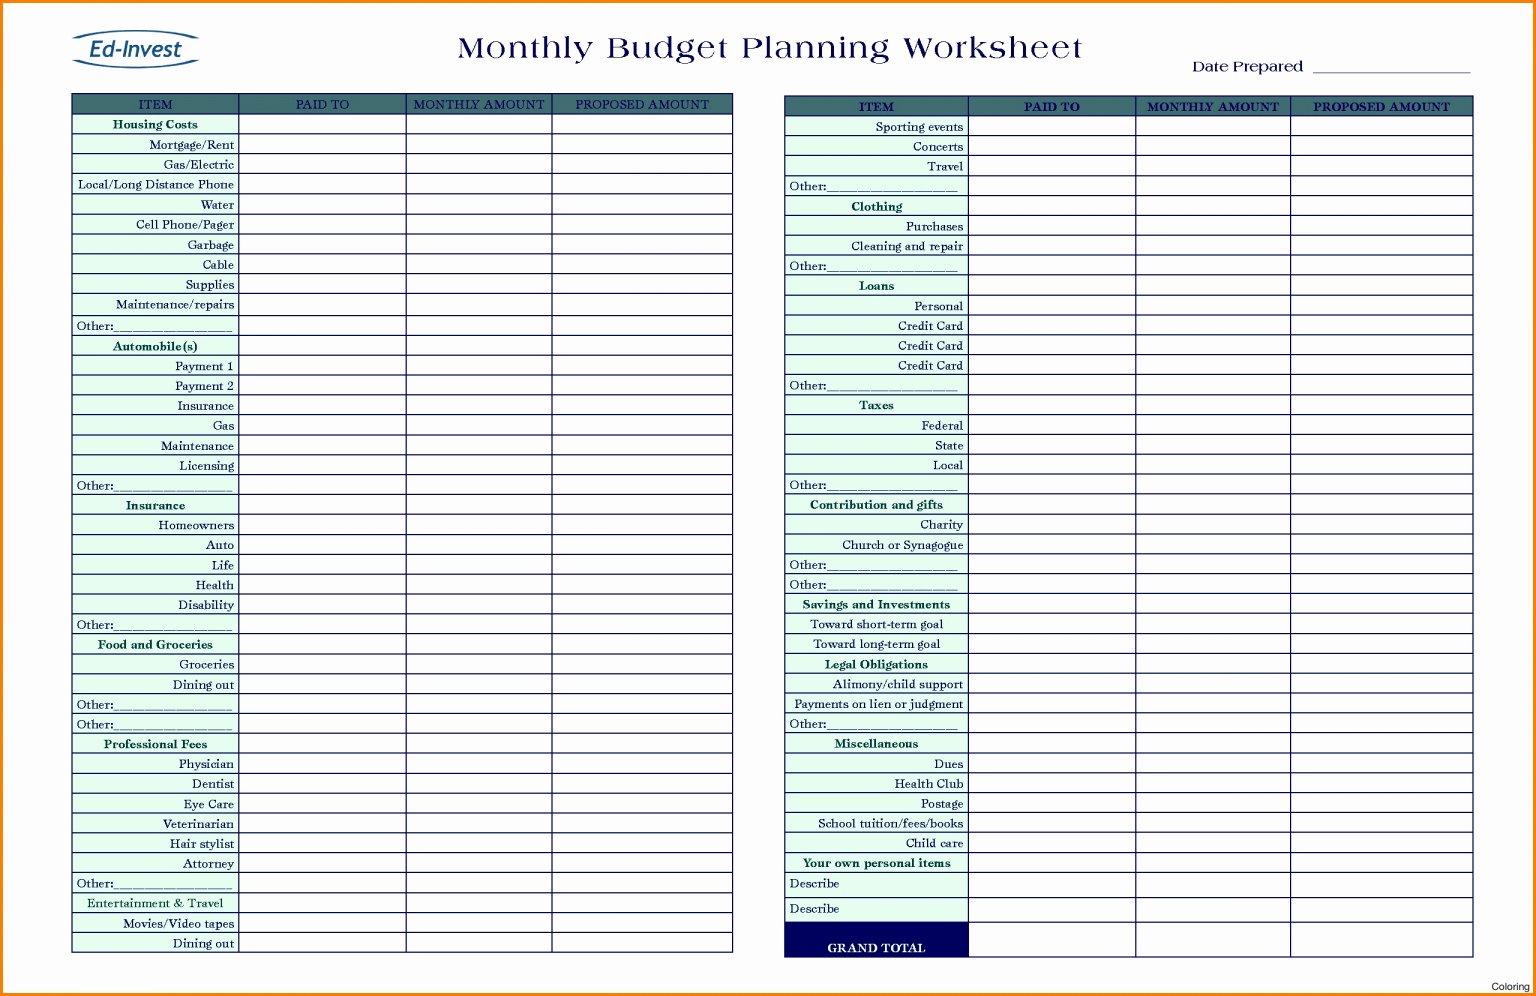 Estate Planning Worksheet Template Unique Awesome Estate Planning Worksheet Template Ulyssesroom